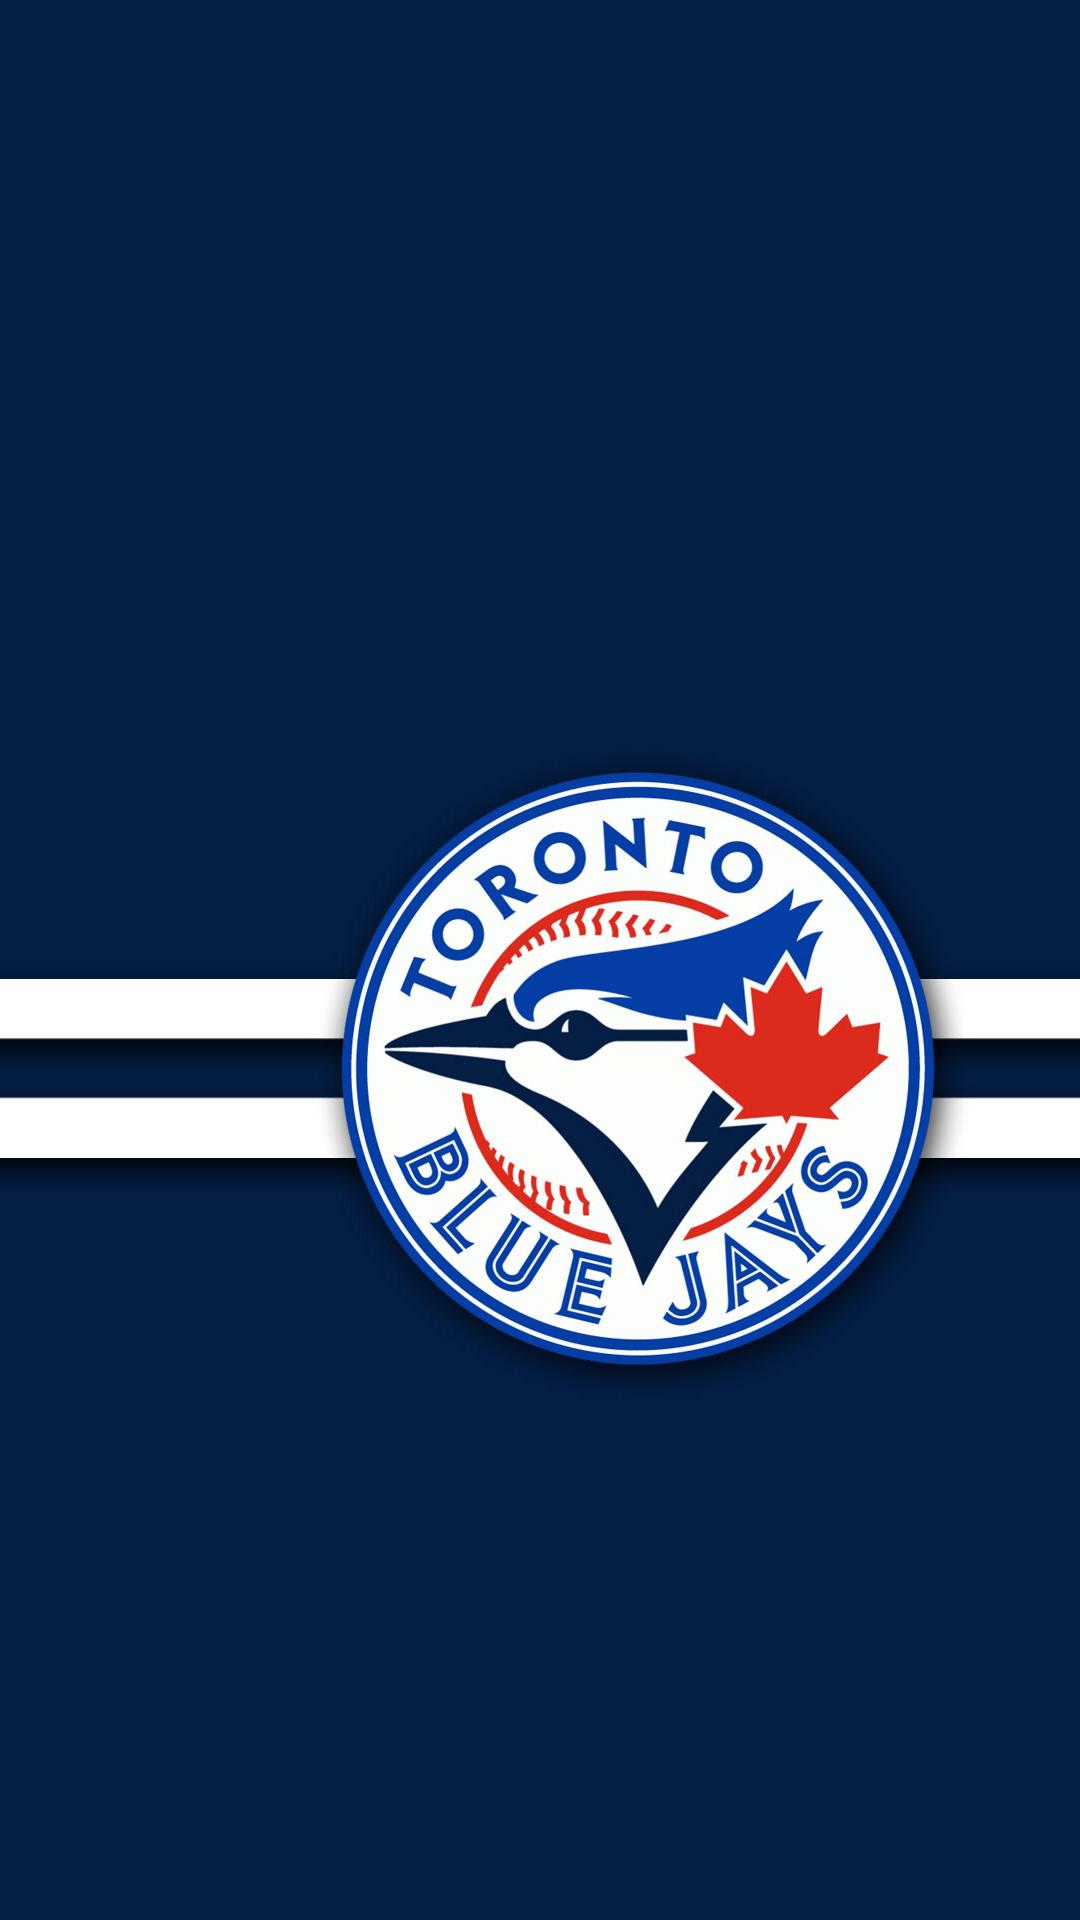 48 Toronto Blue Jays Wallpaper Iphone On Wallpapersafari